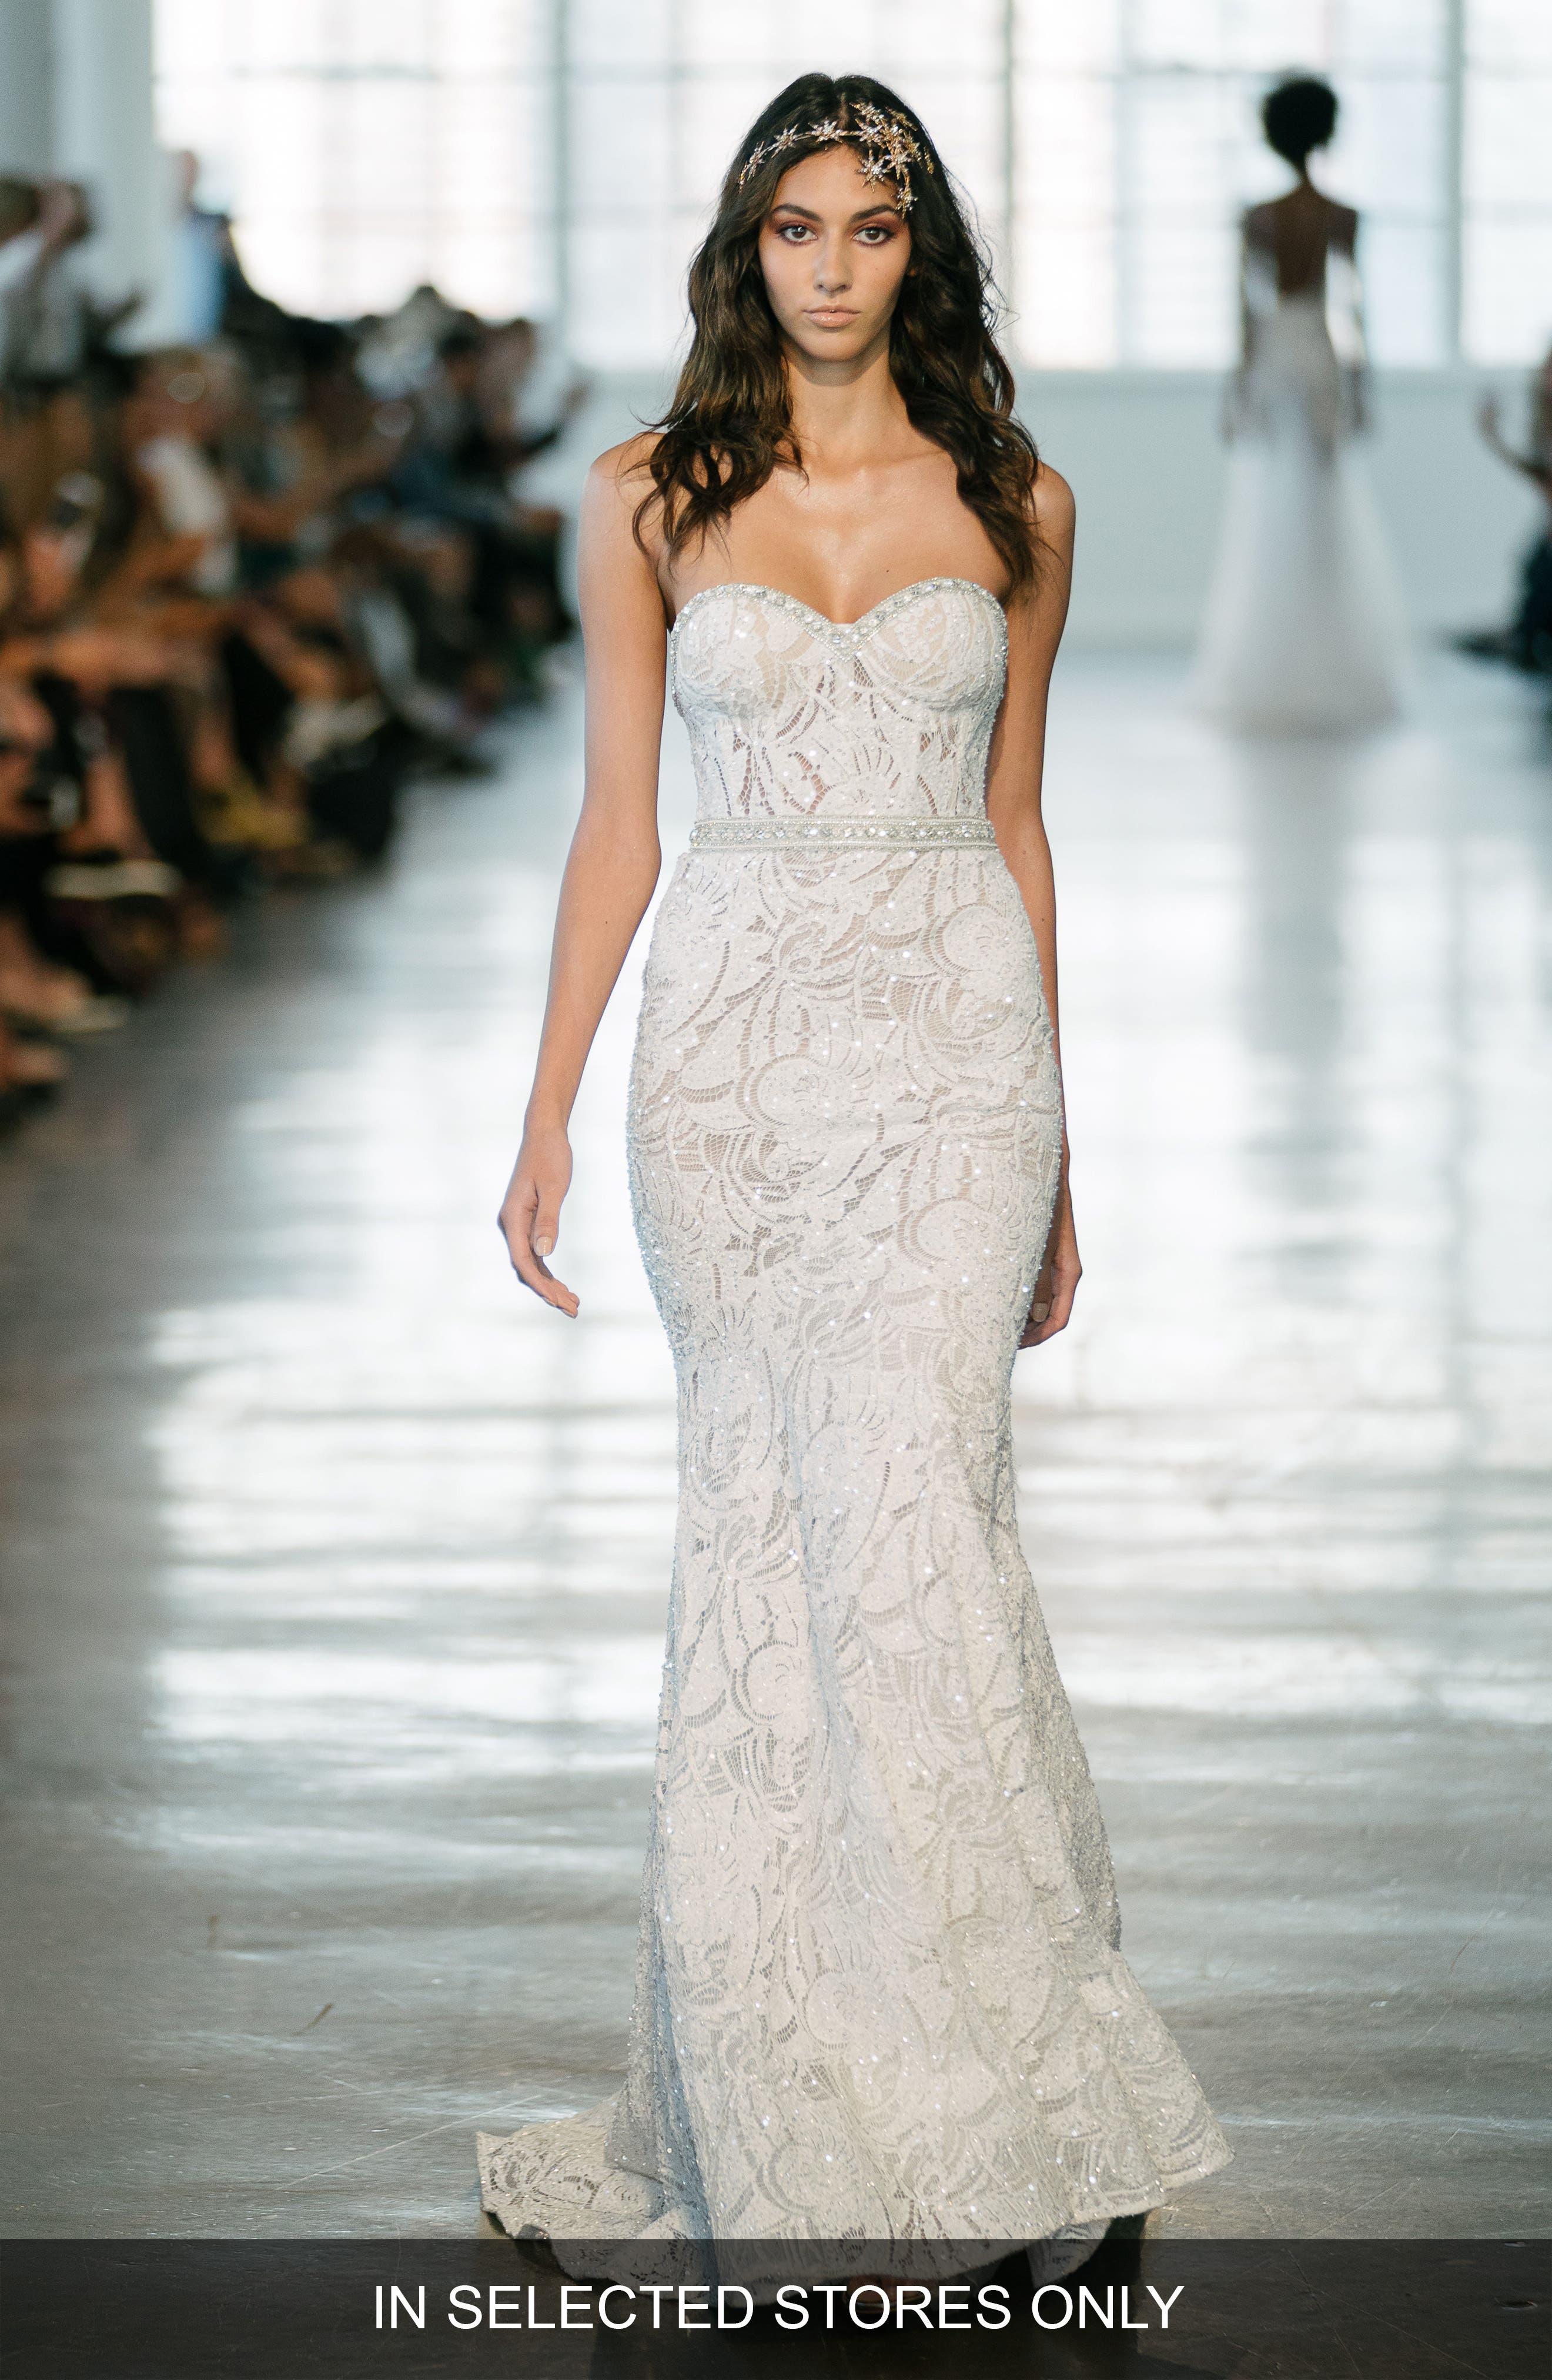 Embellished Wedding Dress